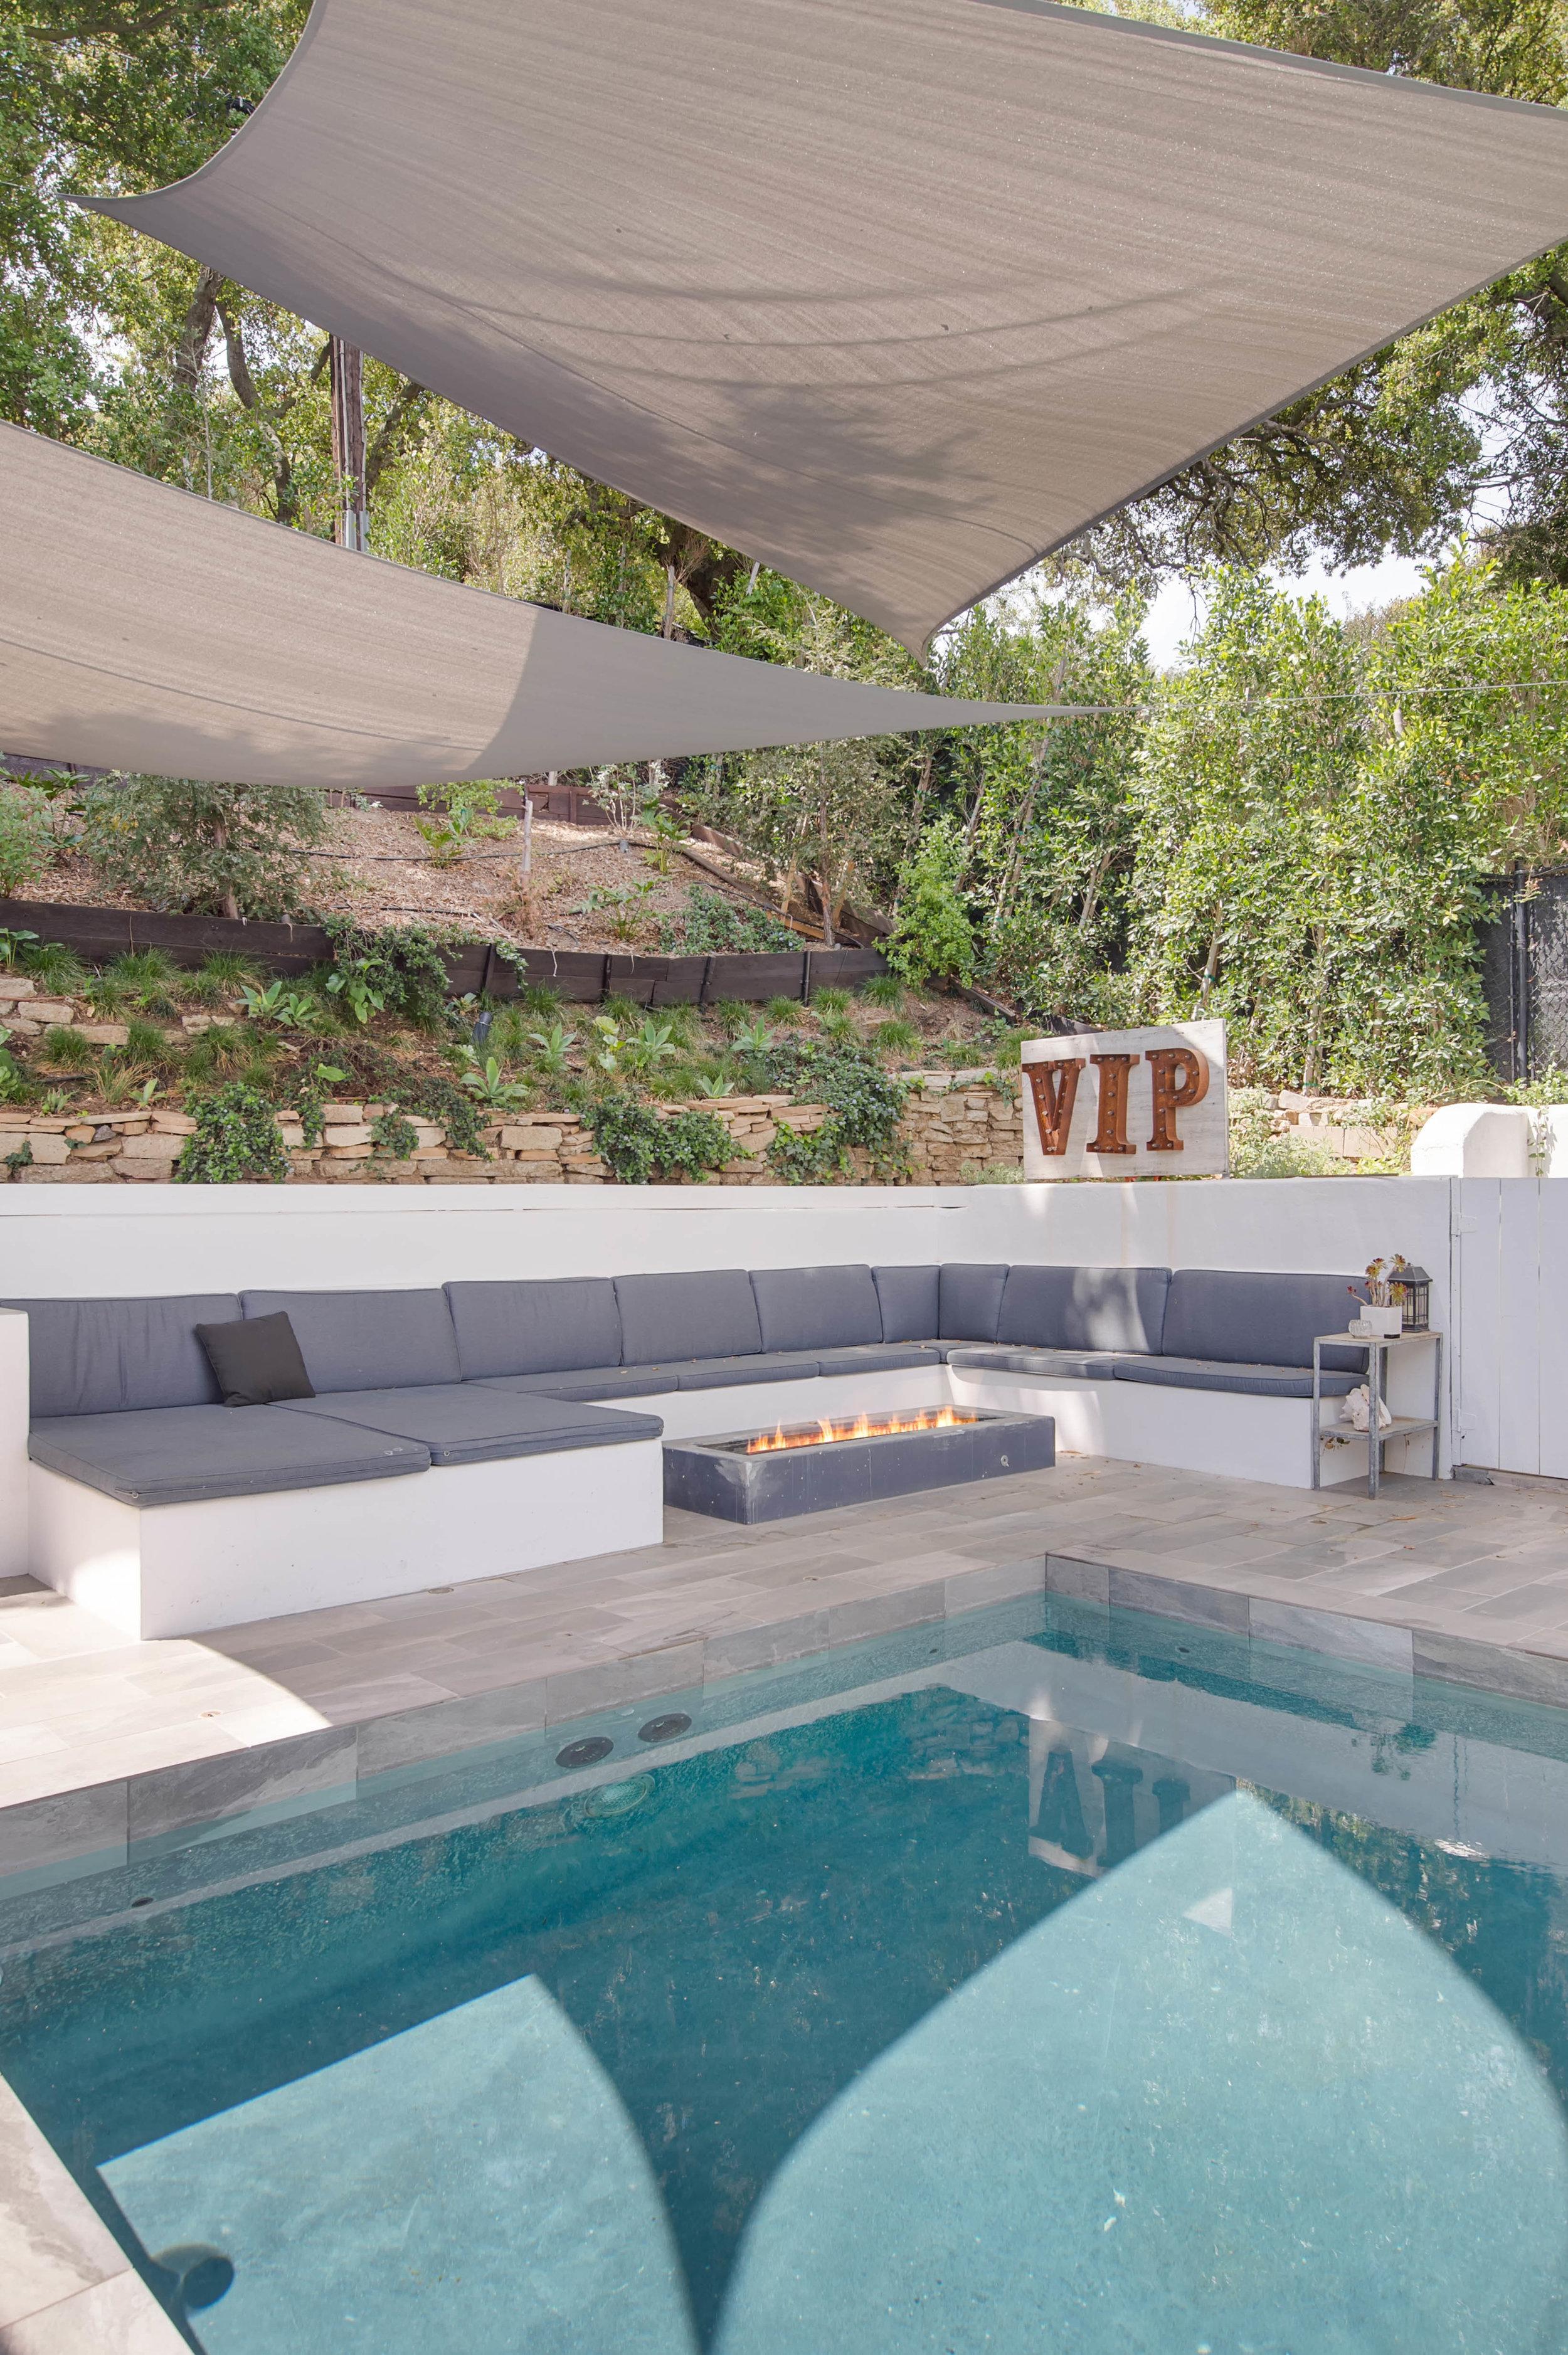 005 Pool 26272 Cool Glen Way Malibu For Sale Luxury Real Estate.jpg